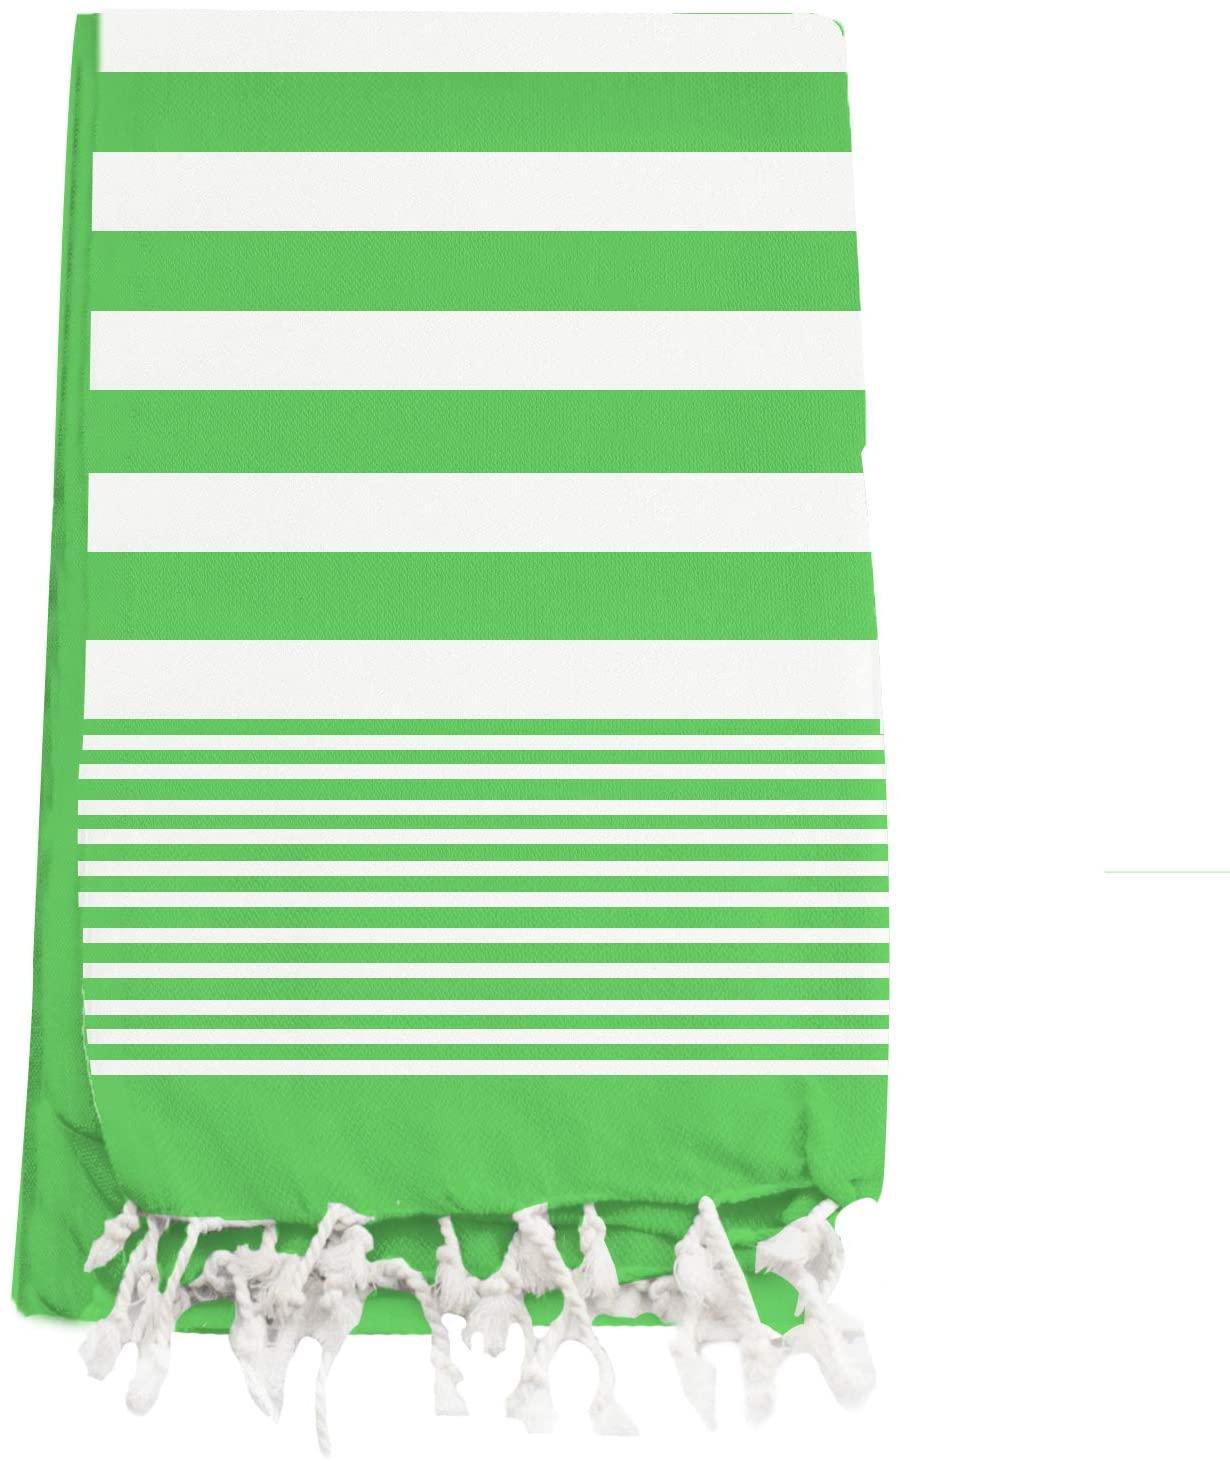 "Linen and Towel Turkish Towel in Cotton Beach Towel, Absorbent Light Weight Bath Towel 40"" x 72"" Light Green Pool Towel, Camping Sauna Gym Blanket Fouta Towels"